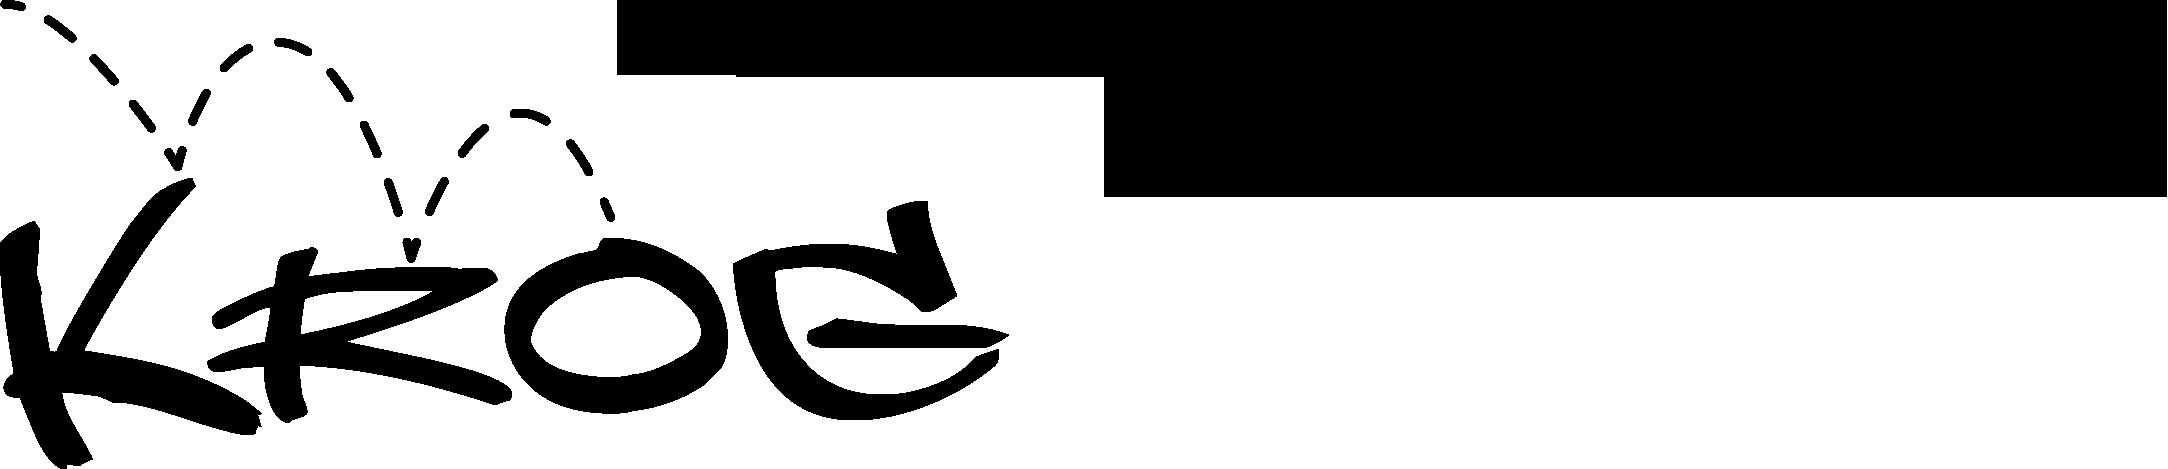 Logo KROG long